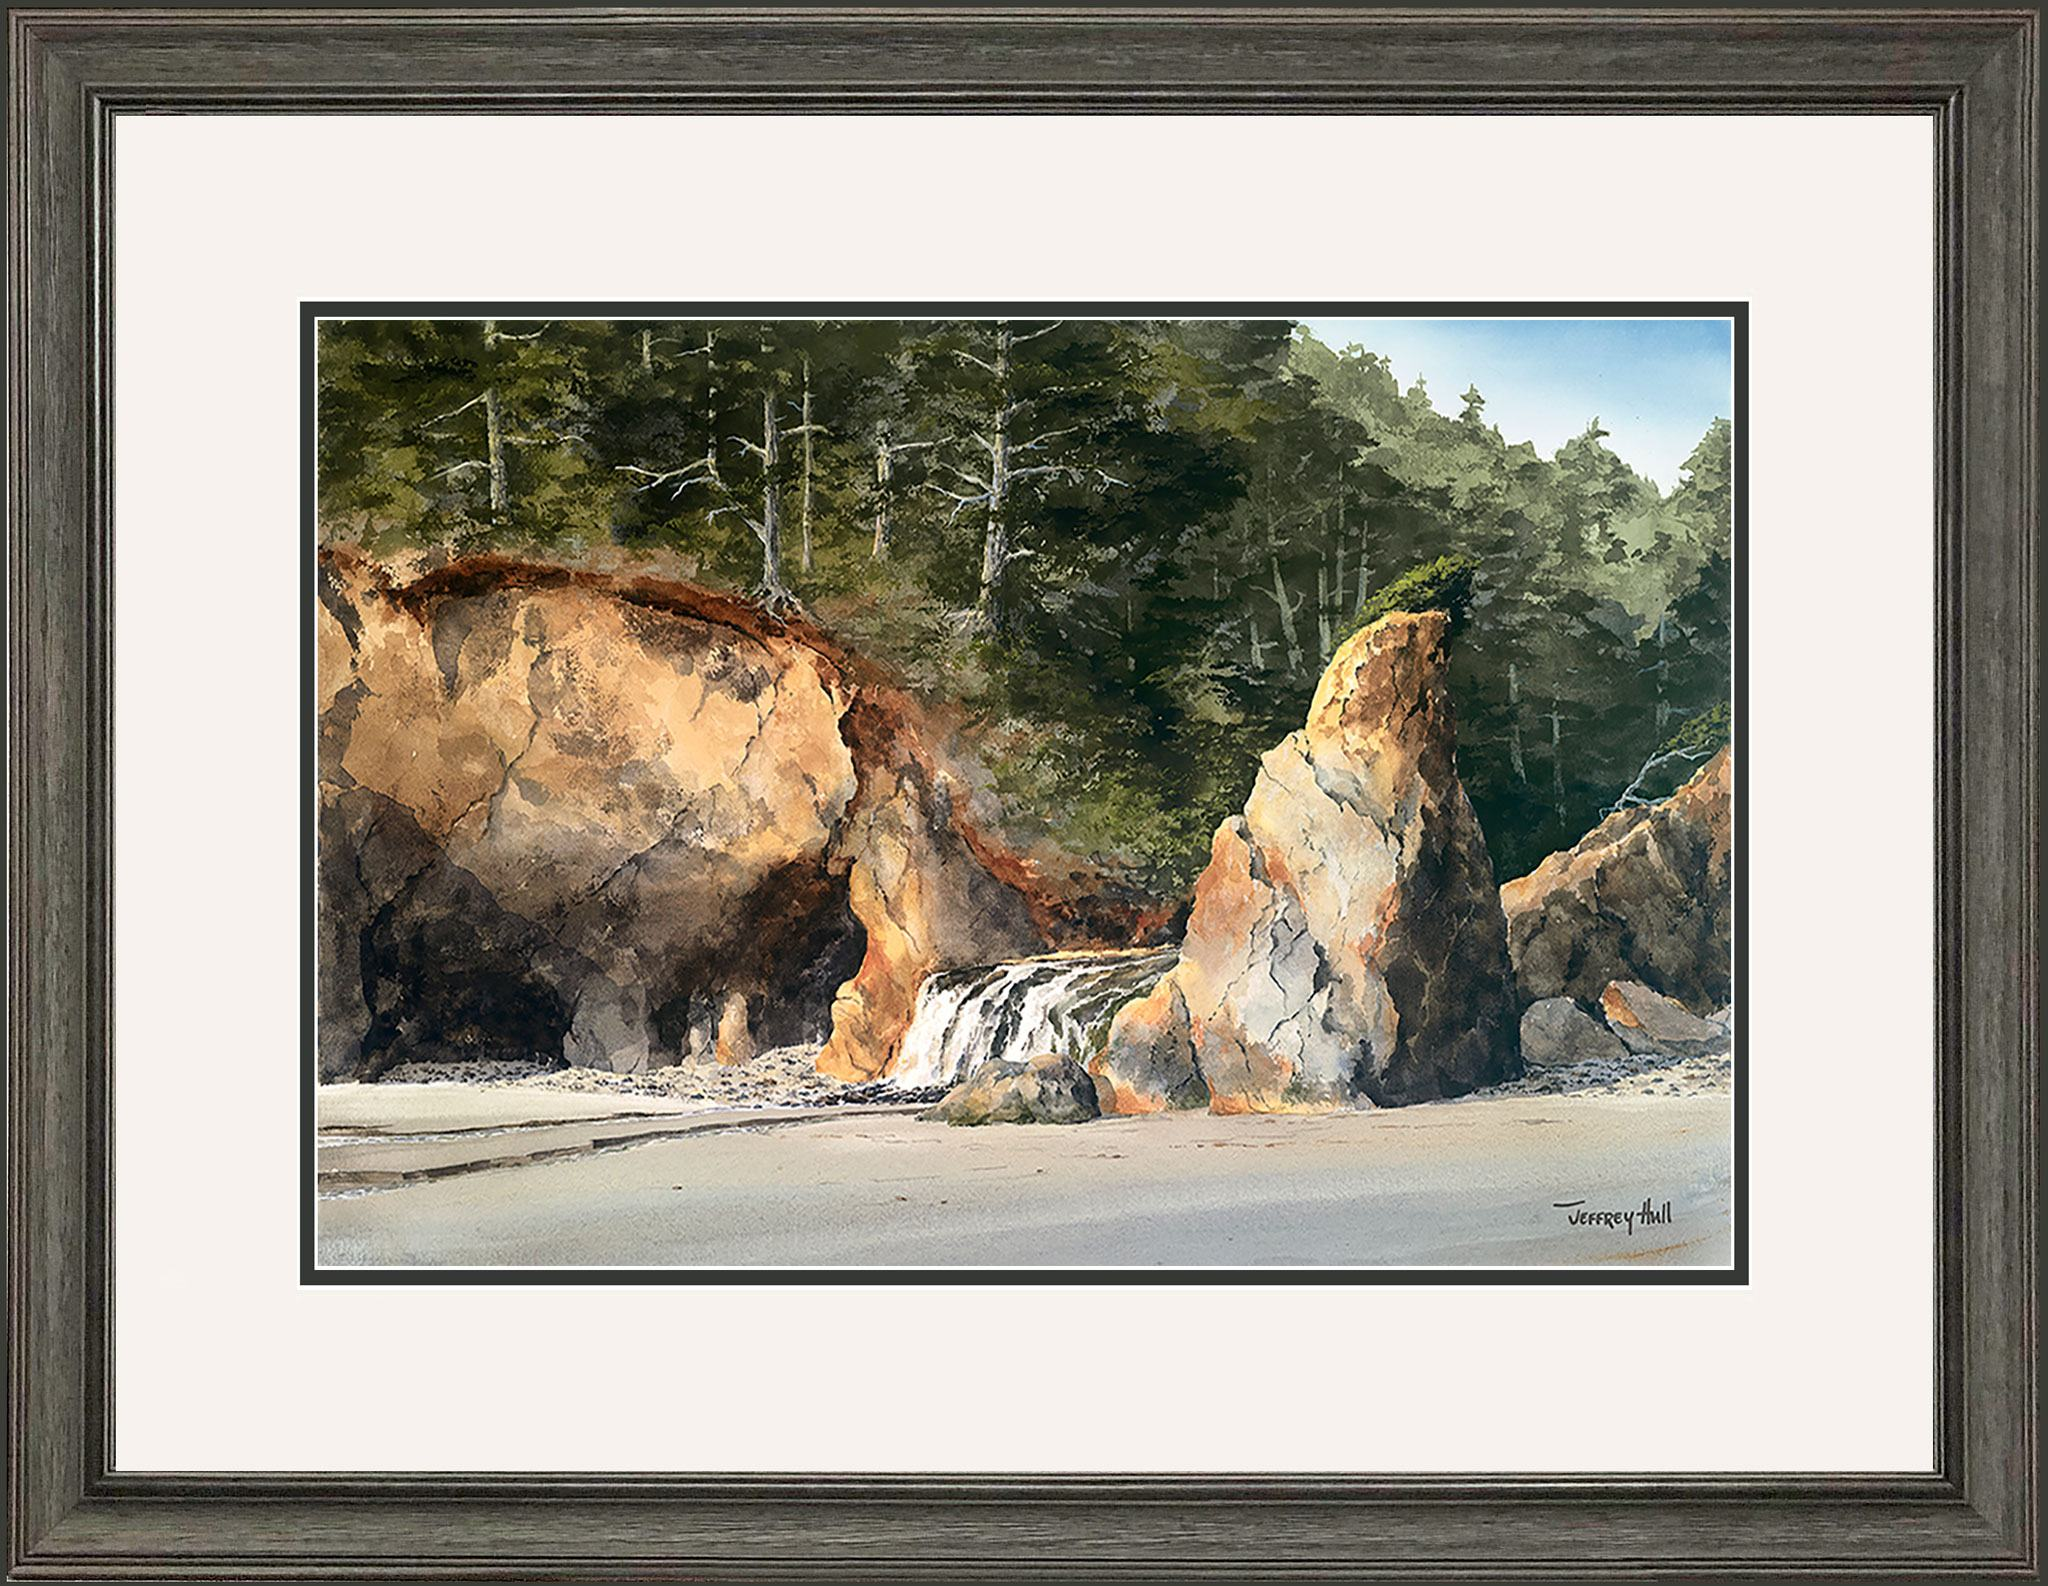 Falls--Hug-Point-LimEd-Cascade-Talc-Dark-Shale-4-Website-2021